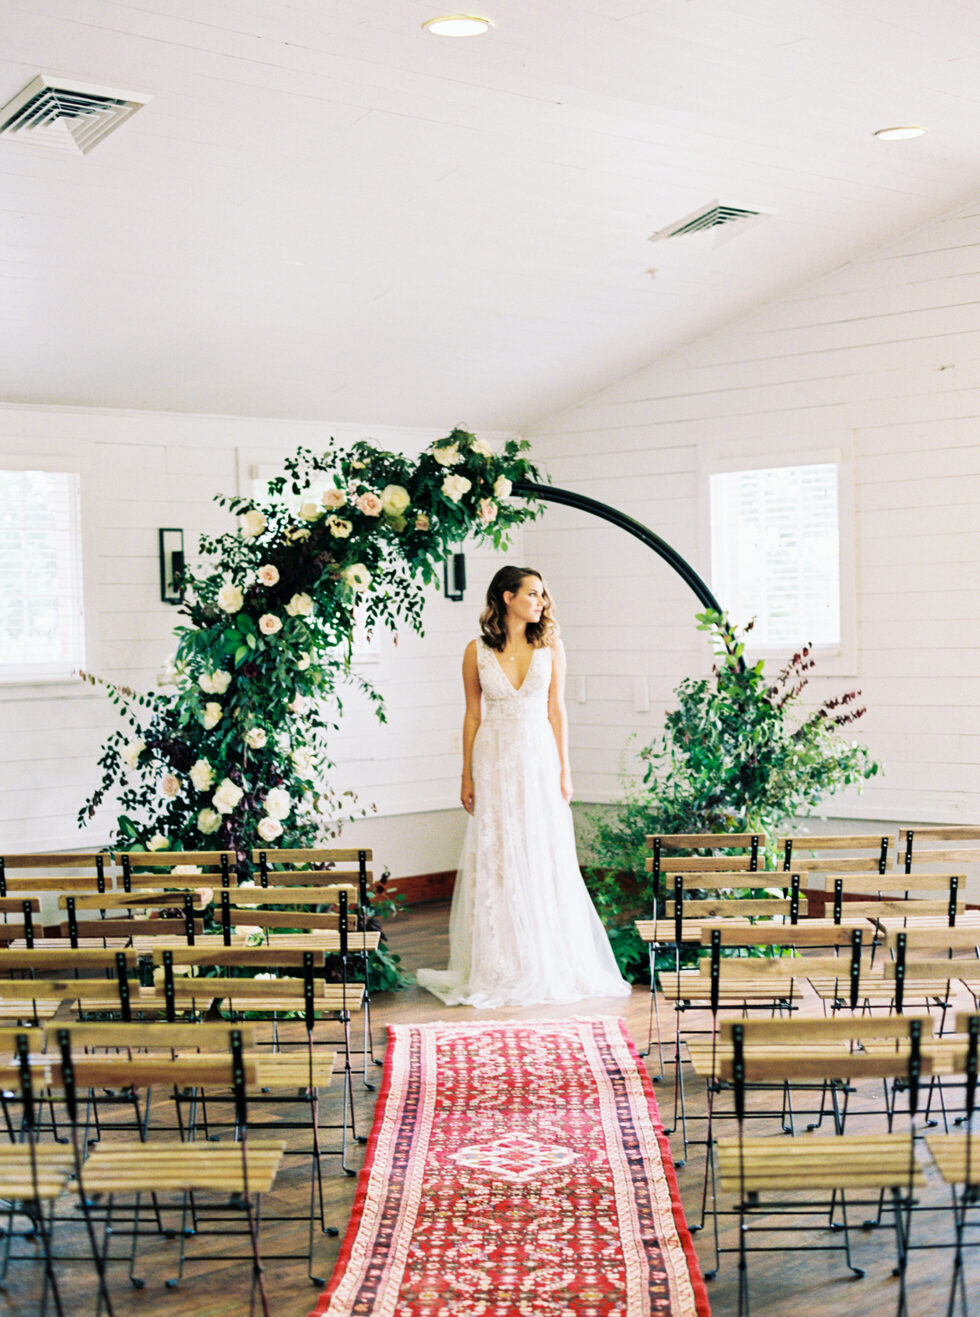 The-Prettiest-Pieces-Fall-Wedding-Winmock-North-Carolina-22